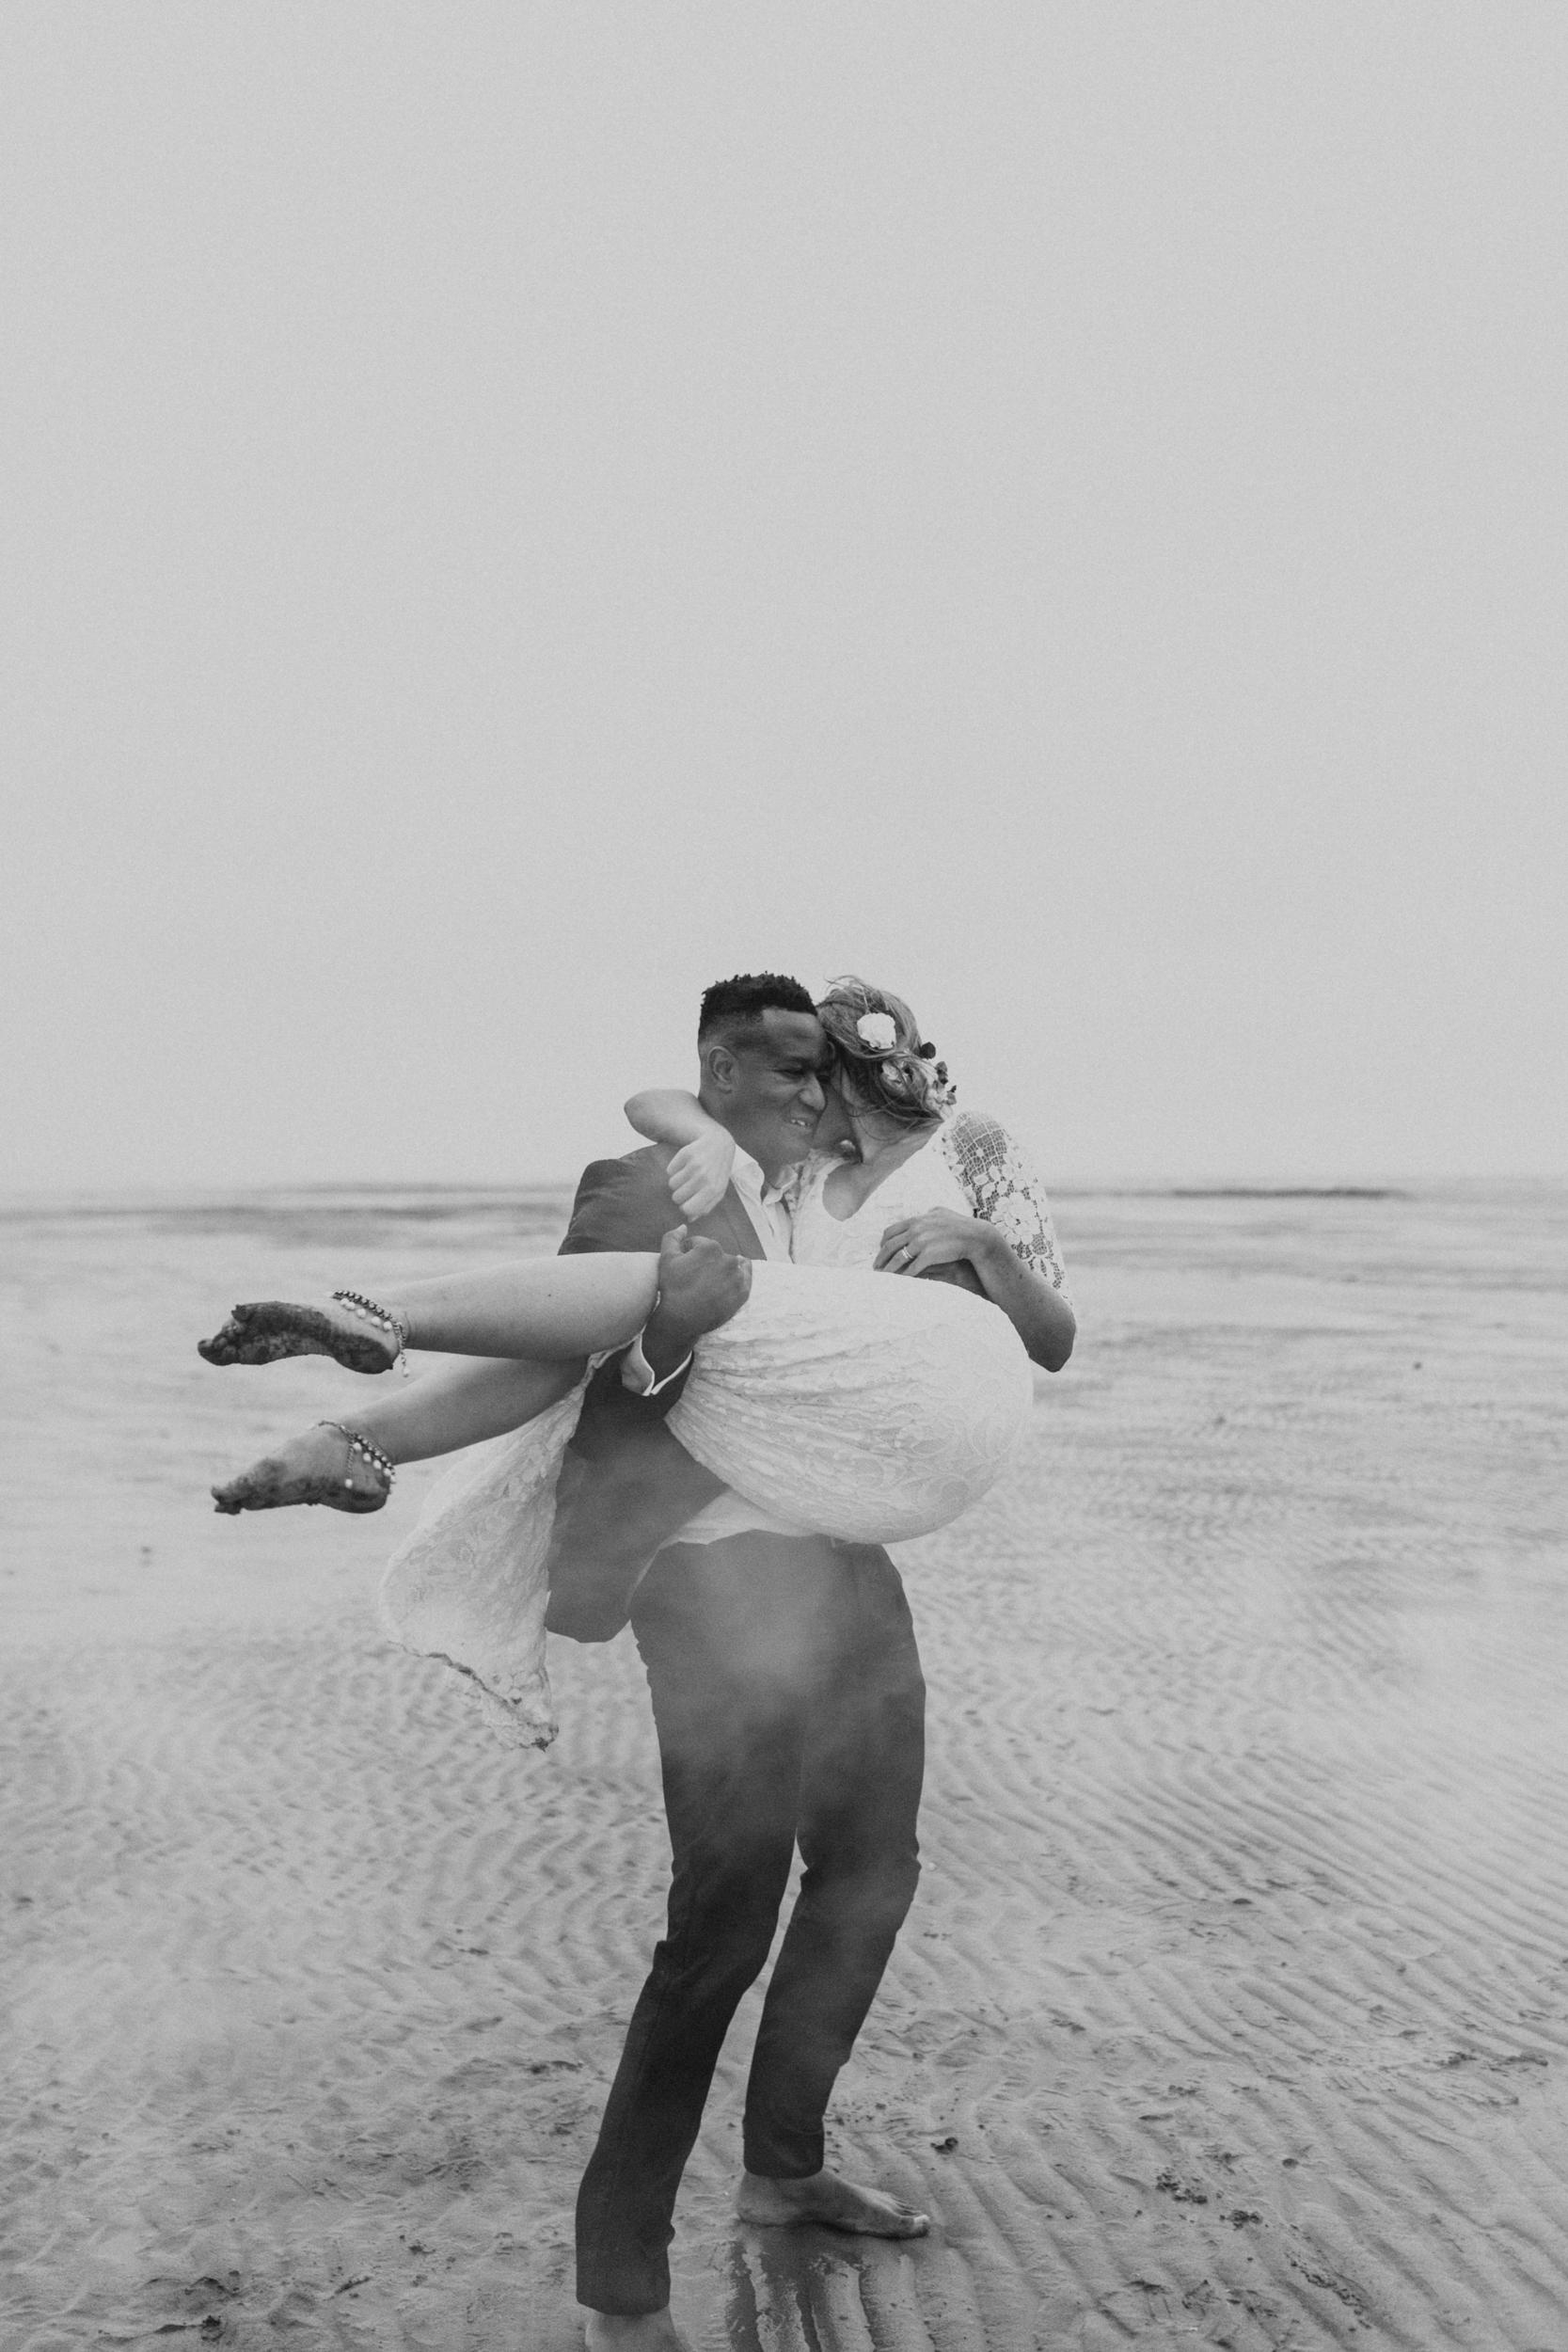 Emma-Tate-Stormy-Norfolk-Beach-Wedding-Shoot-Darina-Stoda-Photography-52.jpg